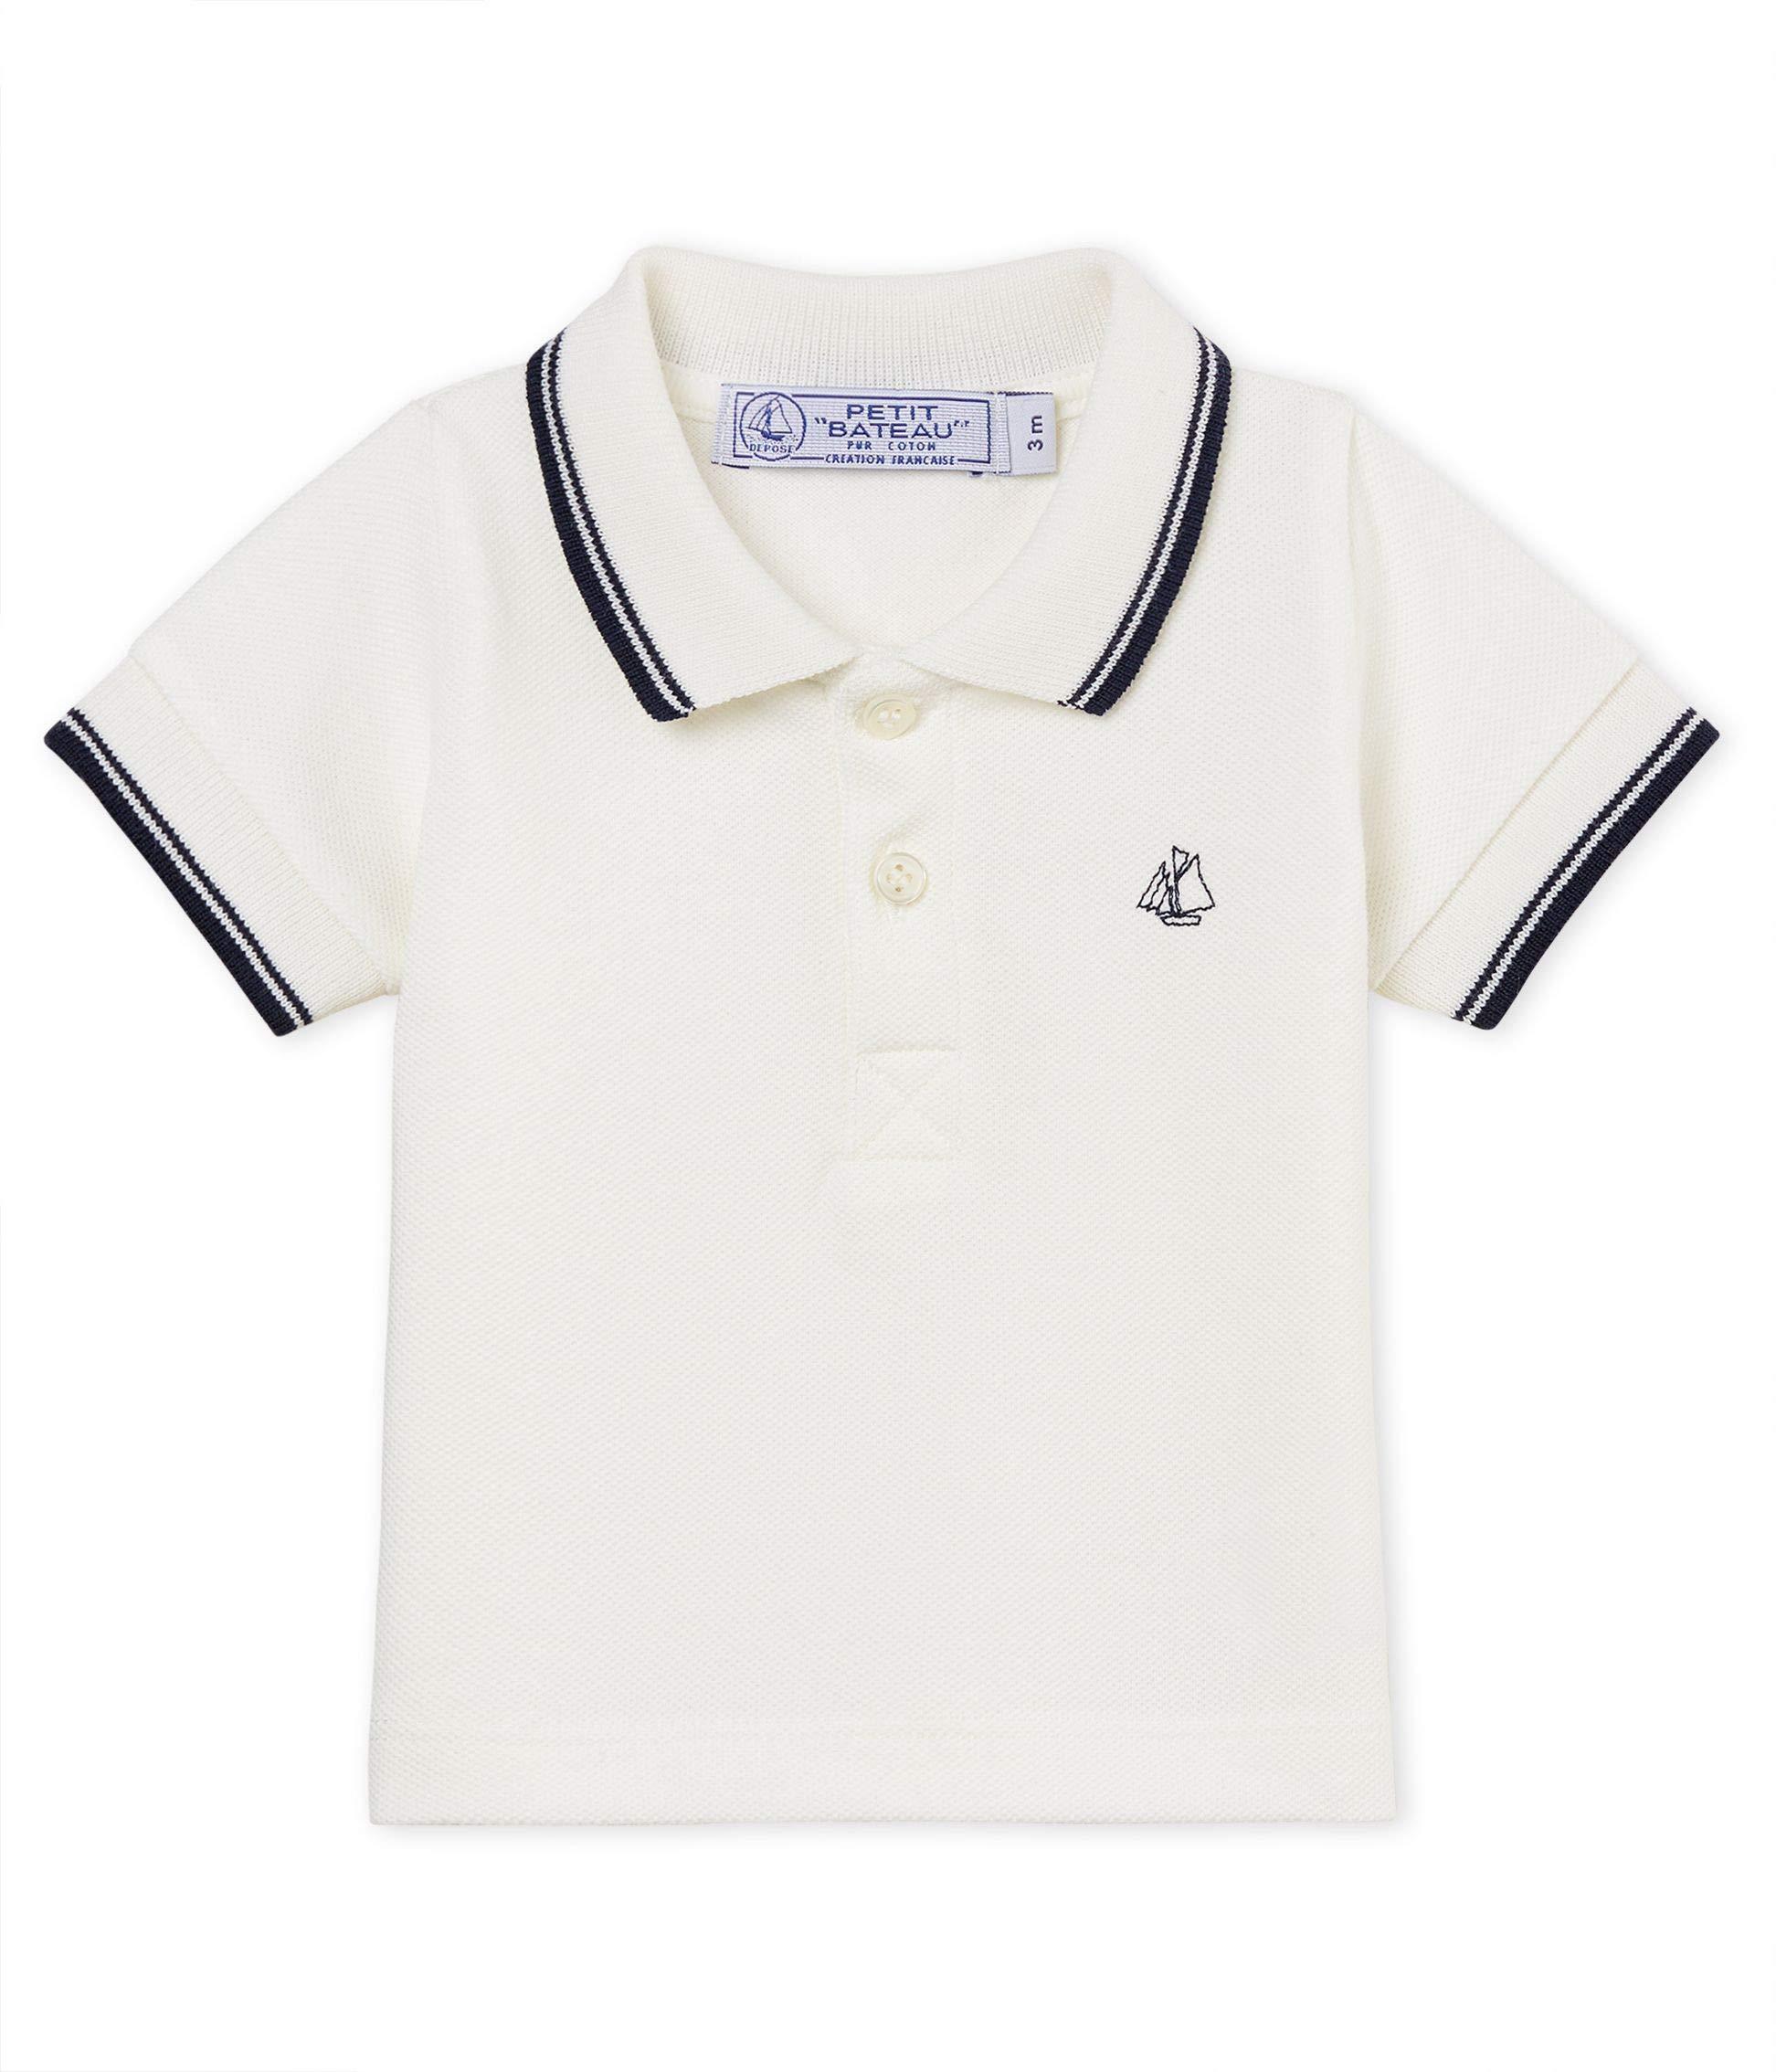 Petit Bateau Baby Boys Short Sleeve Polo, White (12 Months) by Petit Bateau